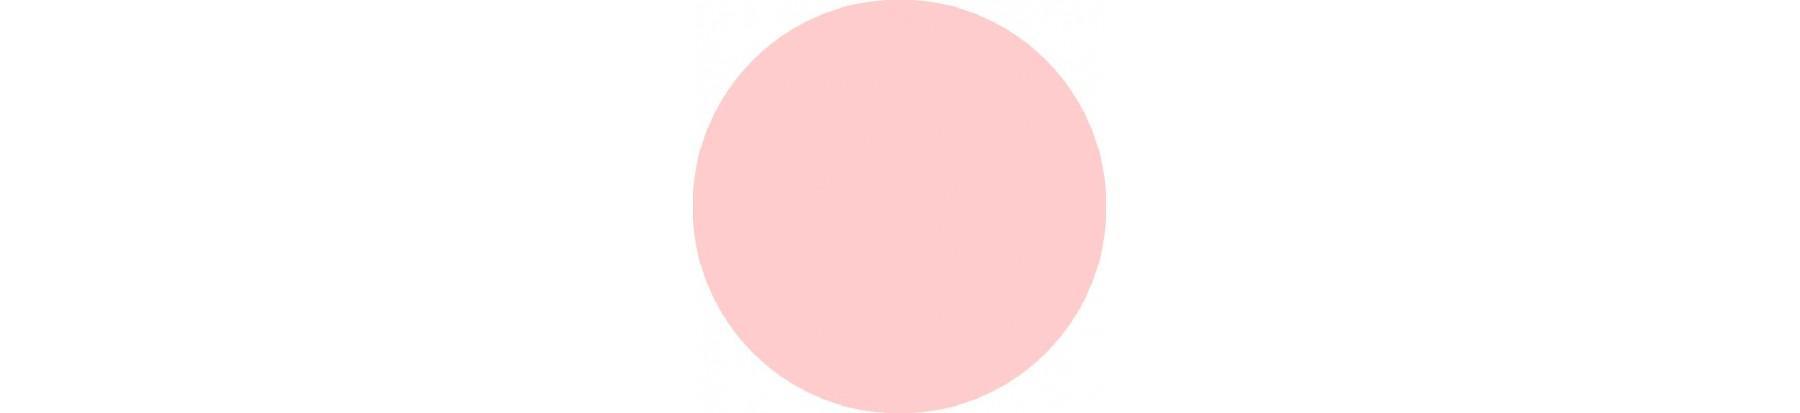 Розовые тени